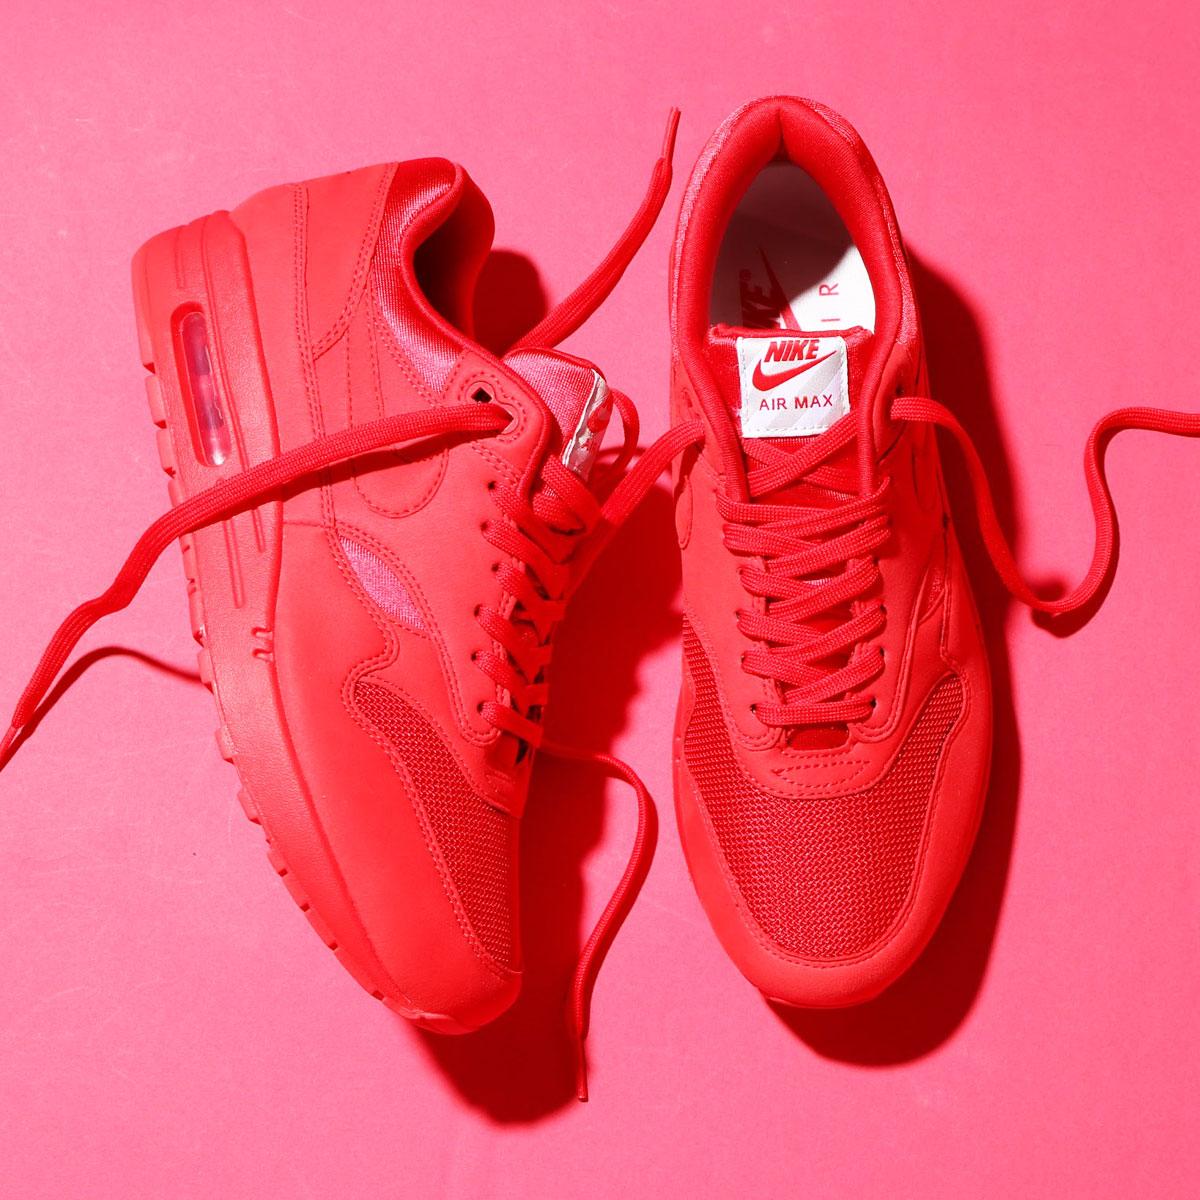 sports shoes 1312c bdce3 NIKE AIR MAX 1 PREMIUM (Kie Ney AMAX 1 premium) UNIVERSITY RED UNIVERSITY  RED 17SU-S